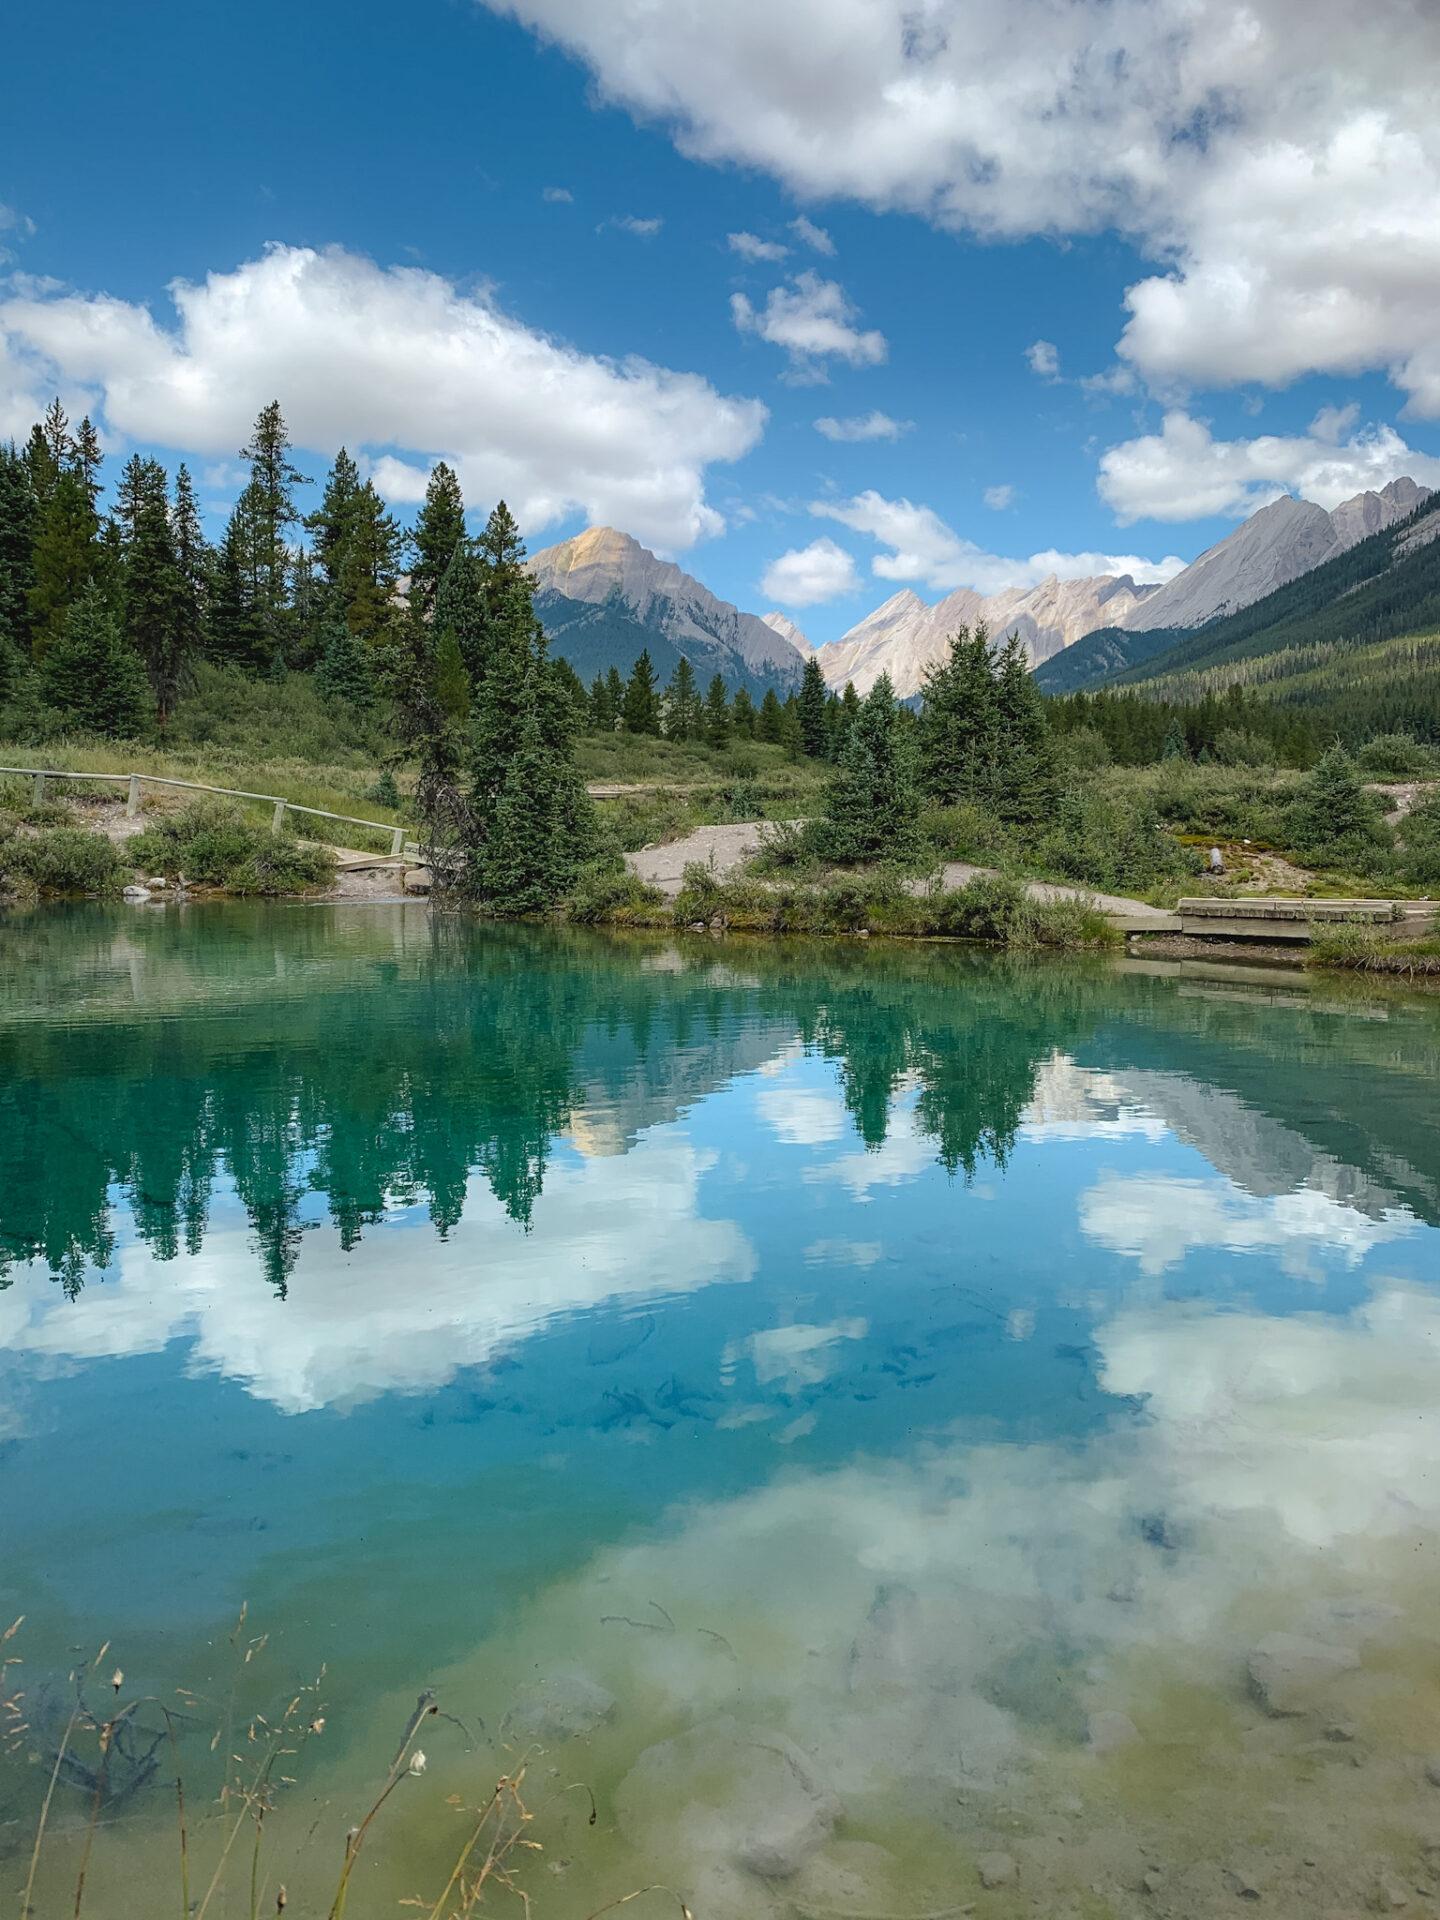 Ink Pots mineral springs in Banff, Alberta